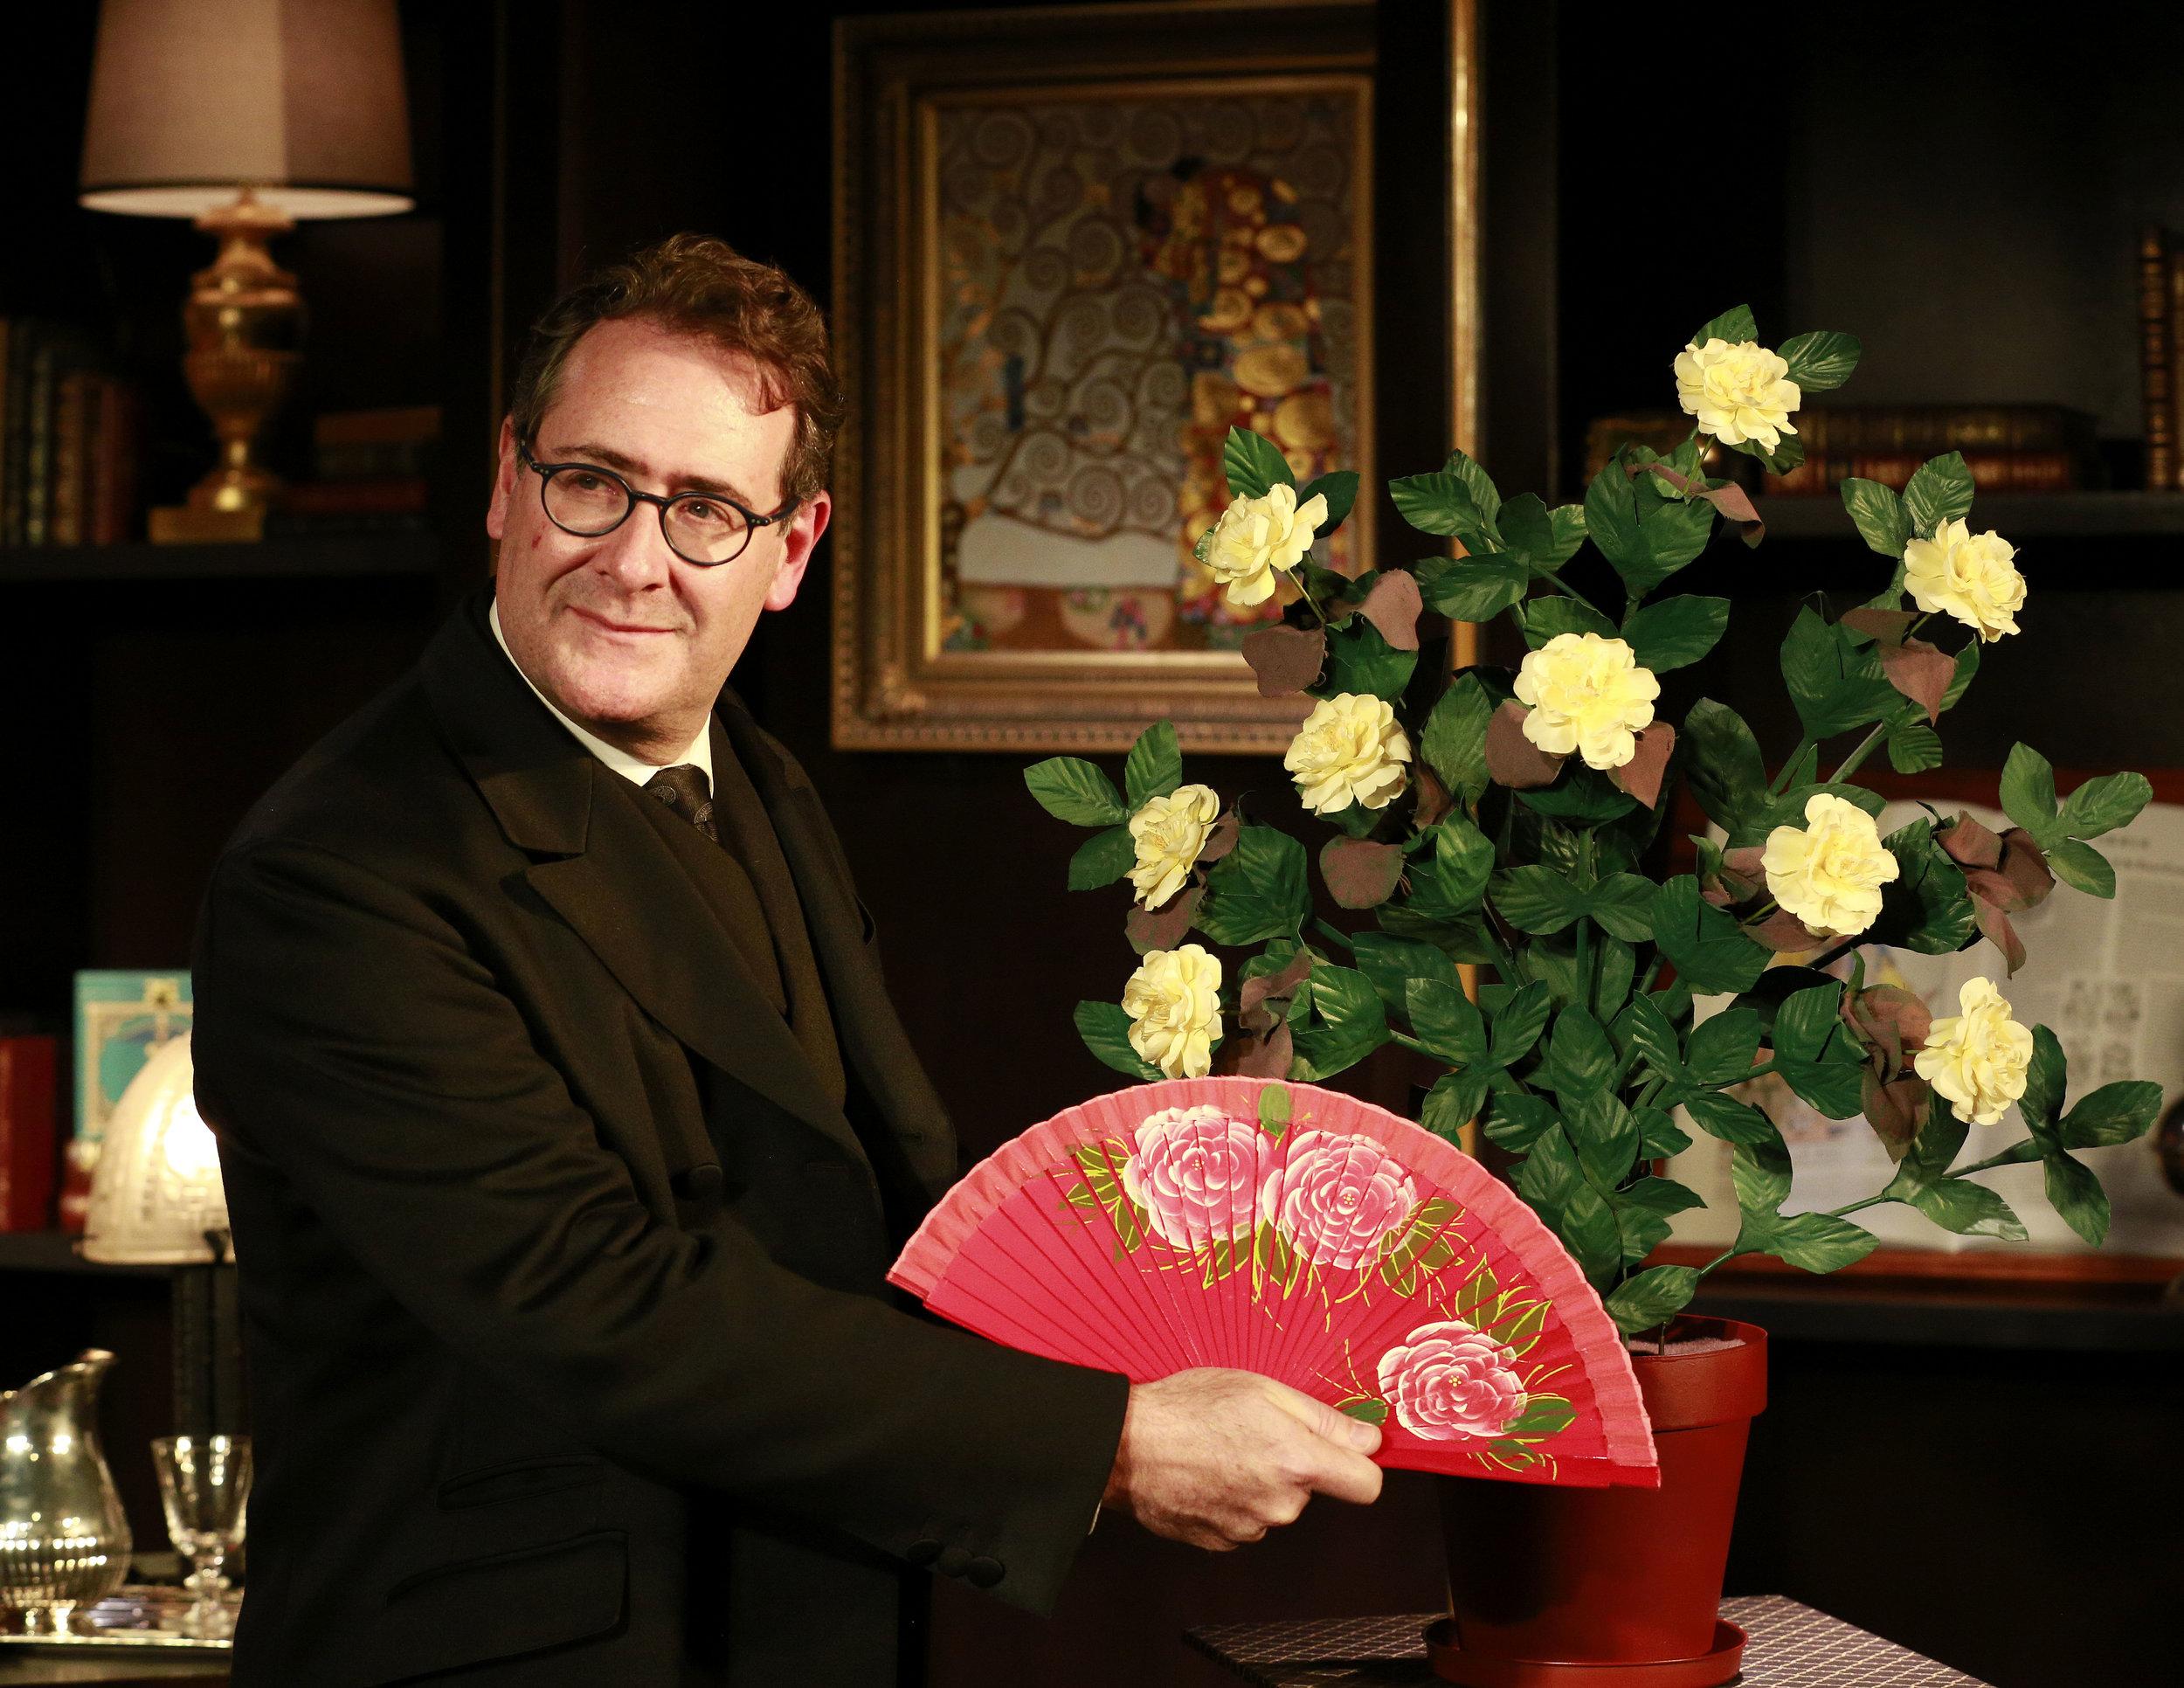 Rosenkranz Mysteries Blooming Rose Bush 1.jpg